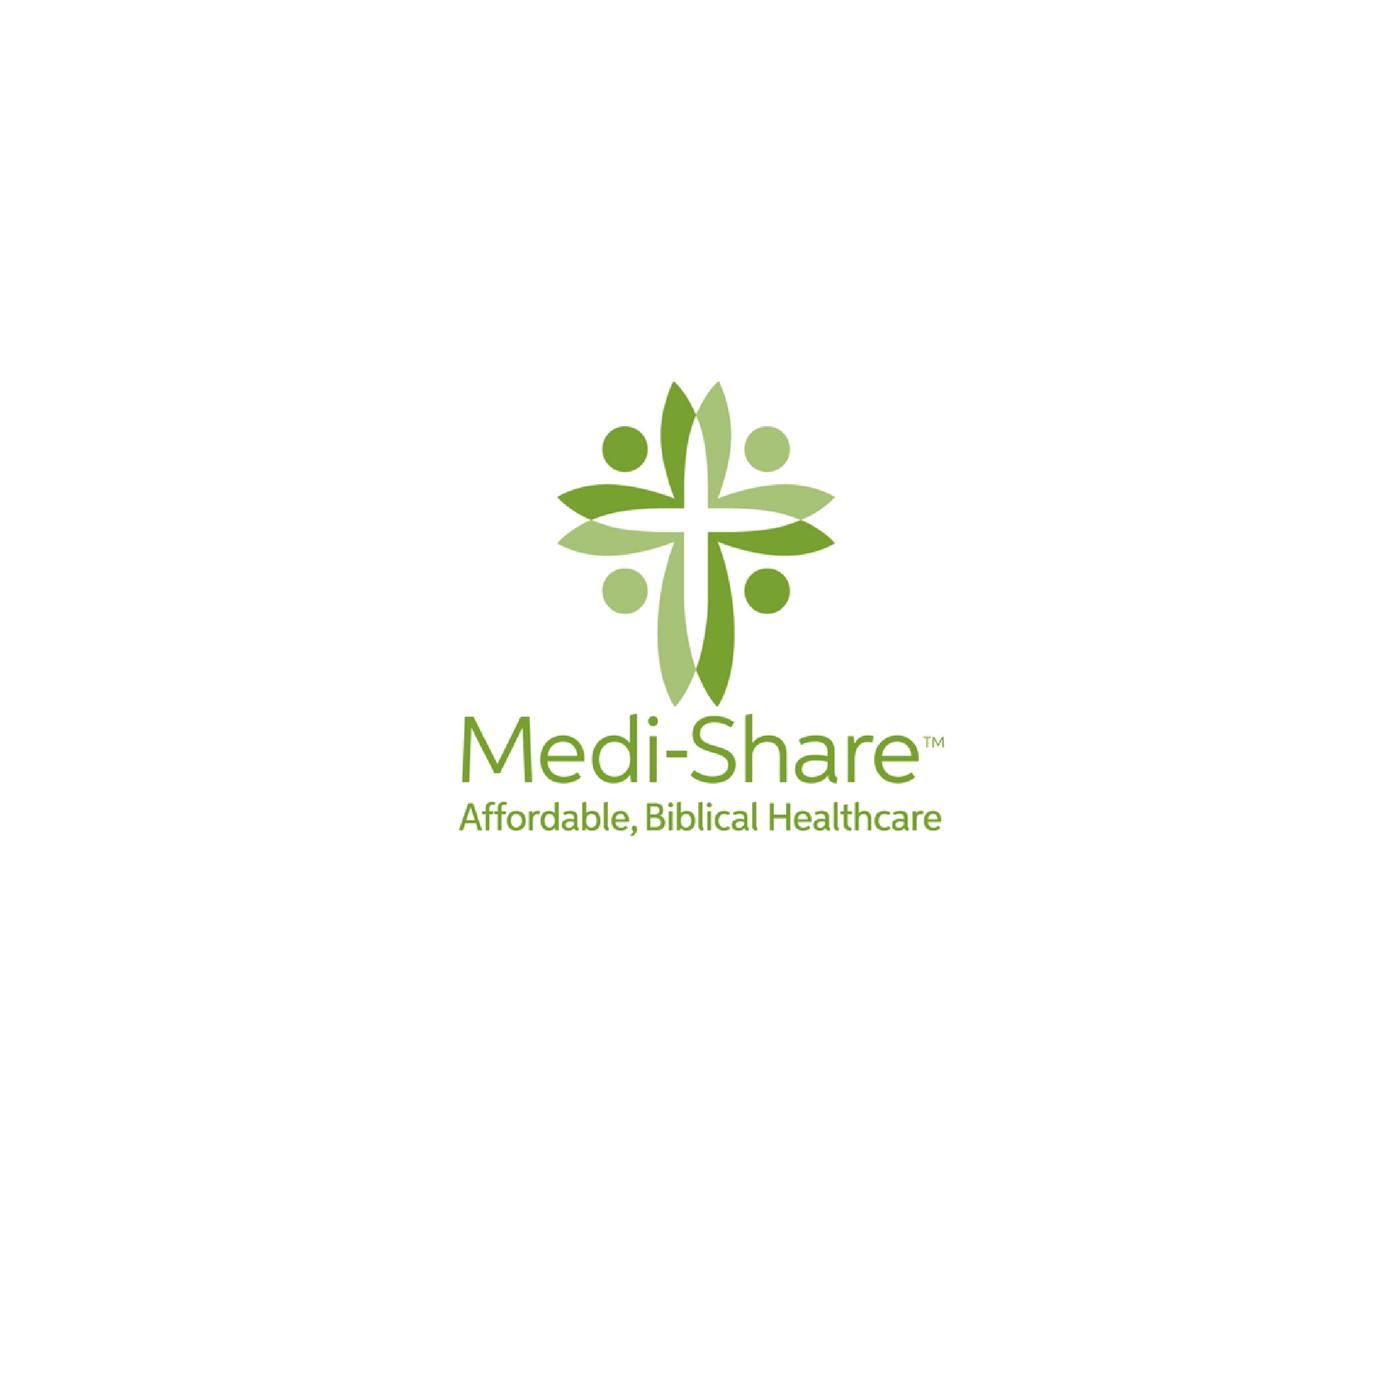 medi-shareSMALLER.png